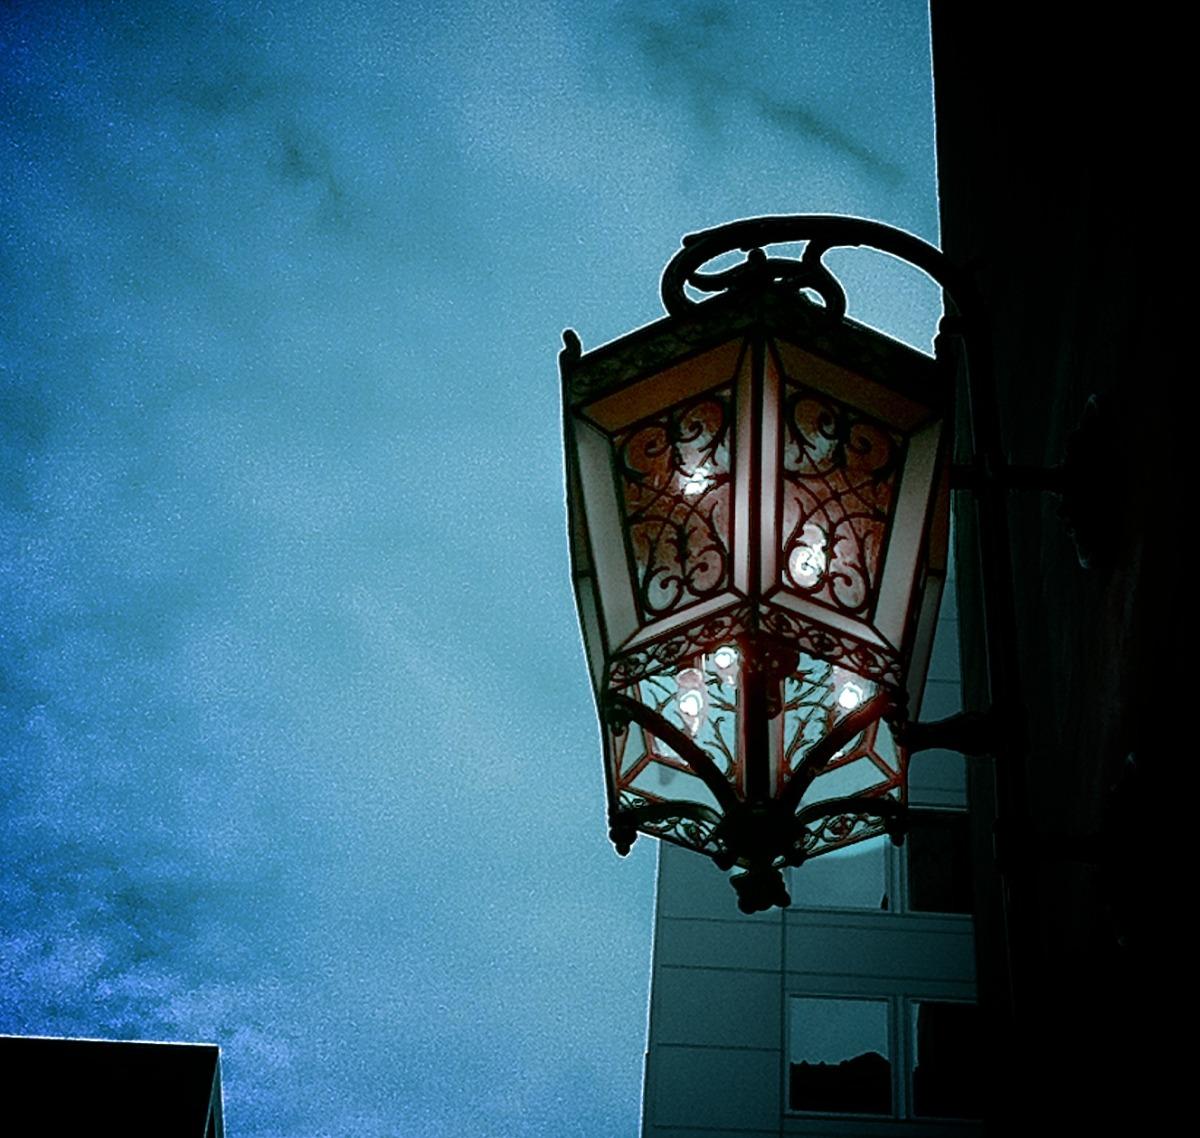 lampshade 8.23 upload 5.jpg